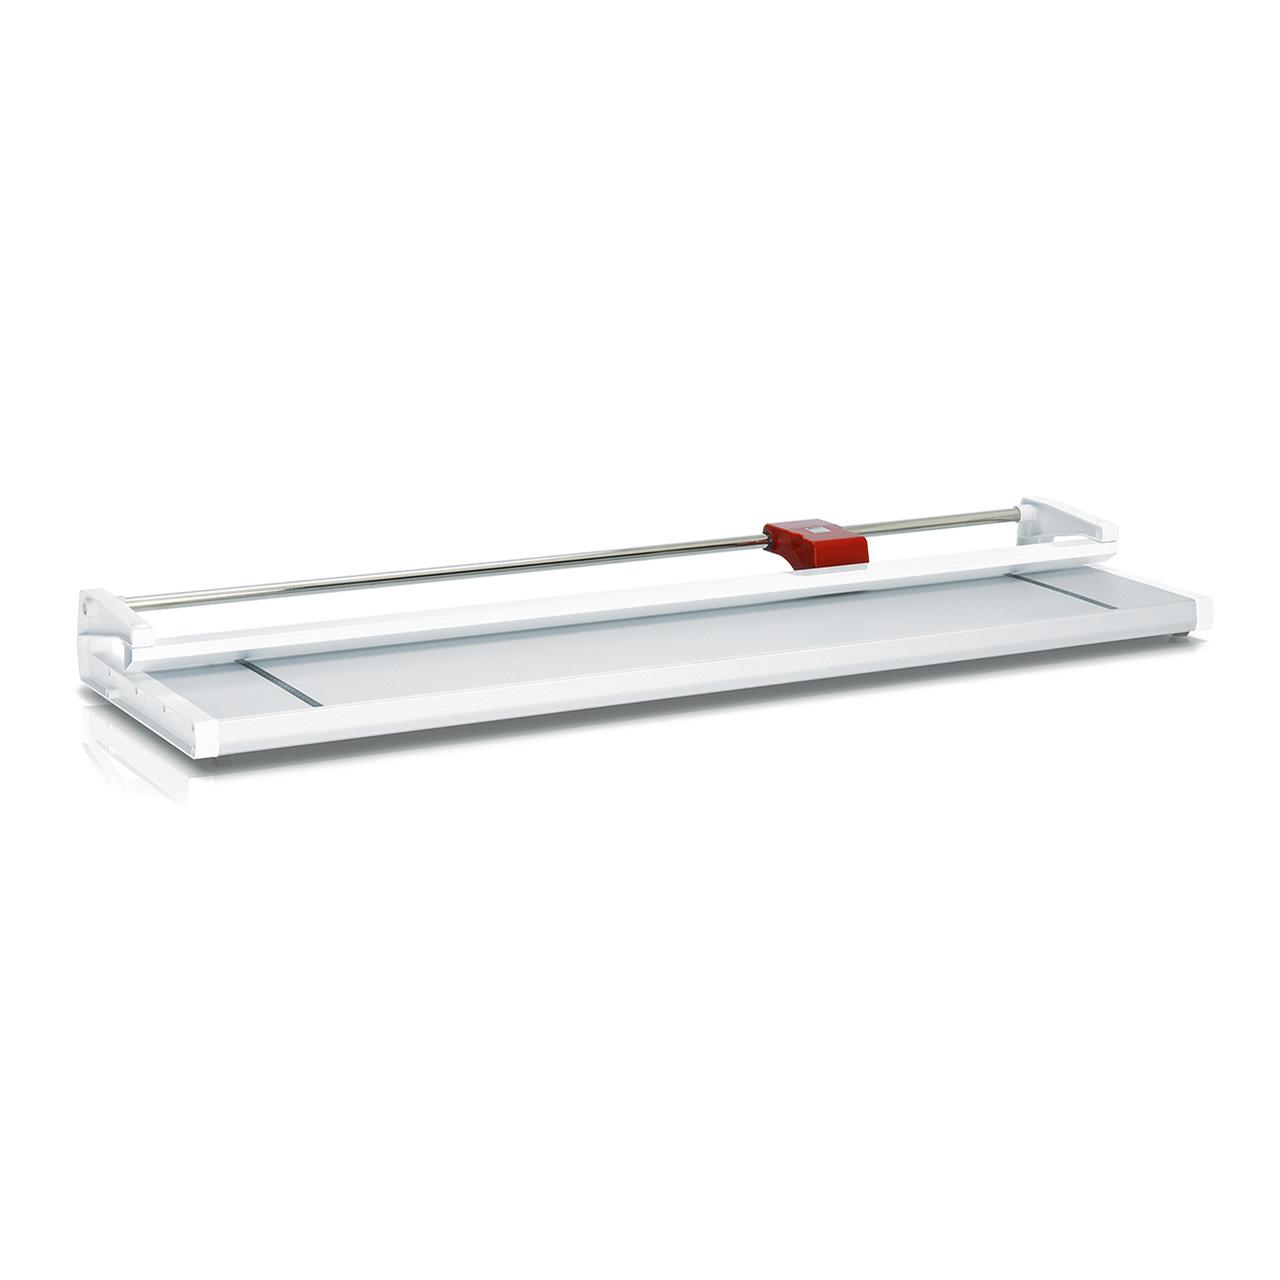 IDEAL Rollenschneider Tischgerät 0105